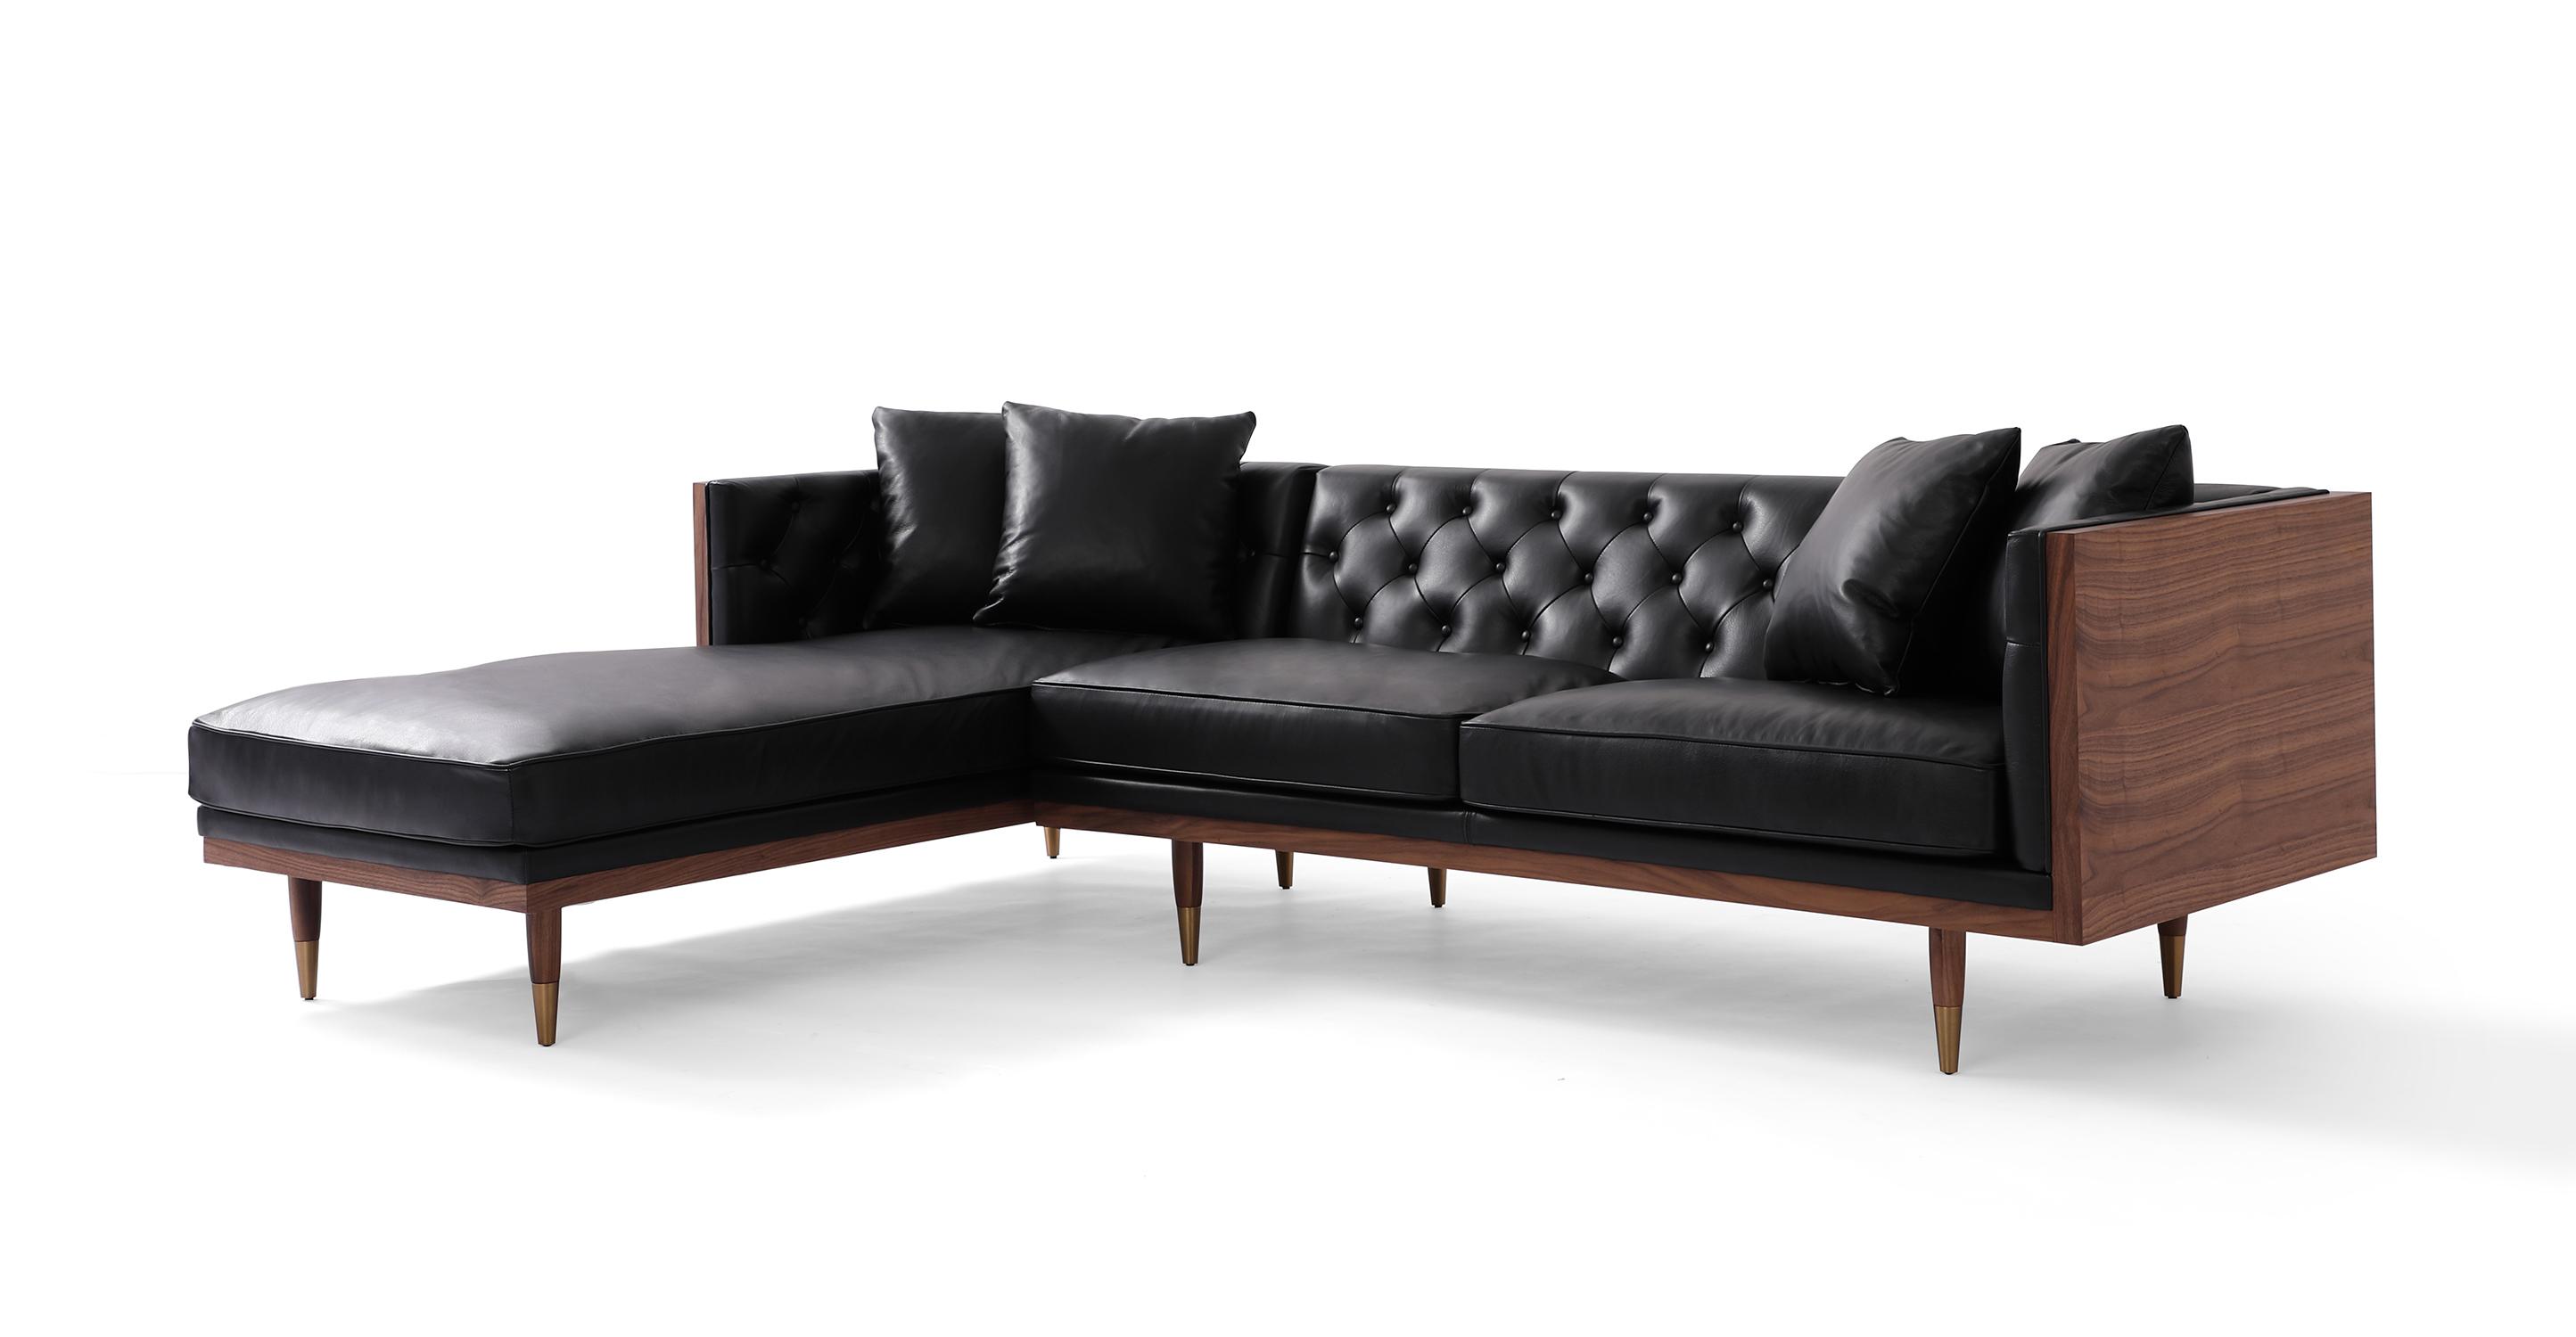 "Woodrow Neo 99"" Leather Sofa Sectional Left, Walnut/Black Aniline"